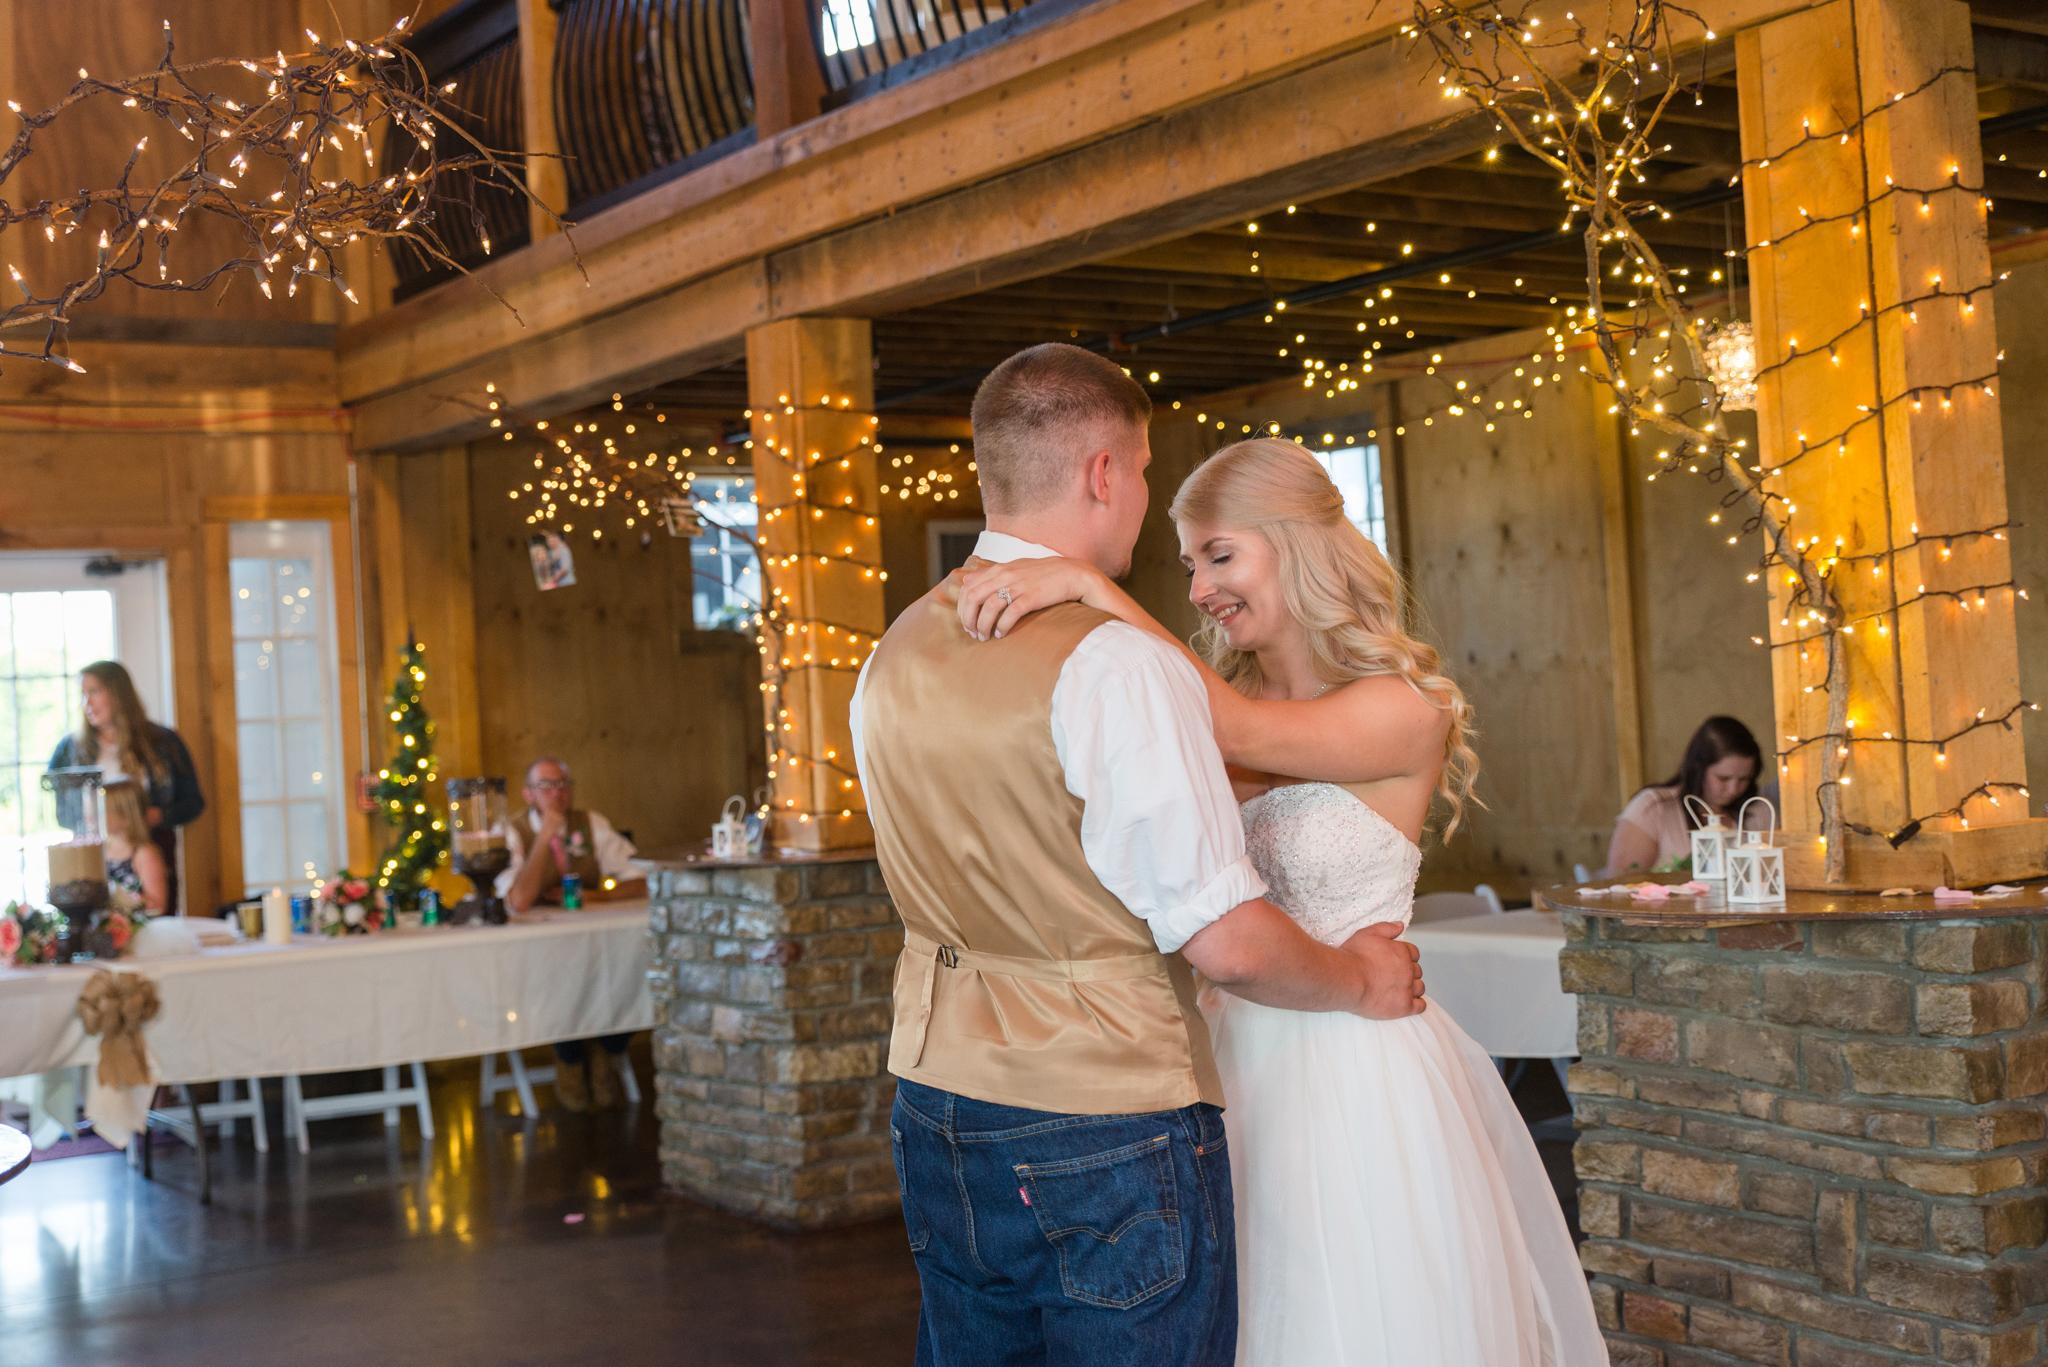 Kentucky, KY wedding, barn wedding, first dance, Josephina Event Venue, Dry Ridge, Louisville, Lexington, Somerset, Ashland, Morehead, Winchester, Mt Sterling, West Chester